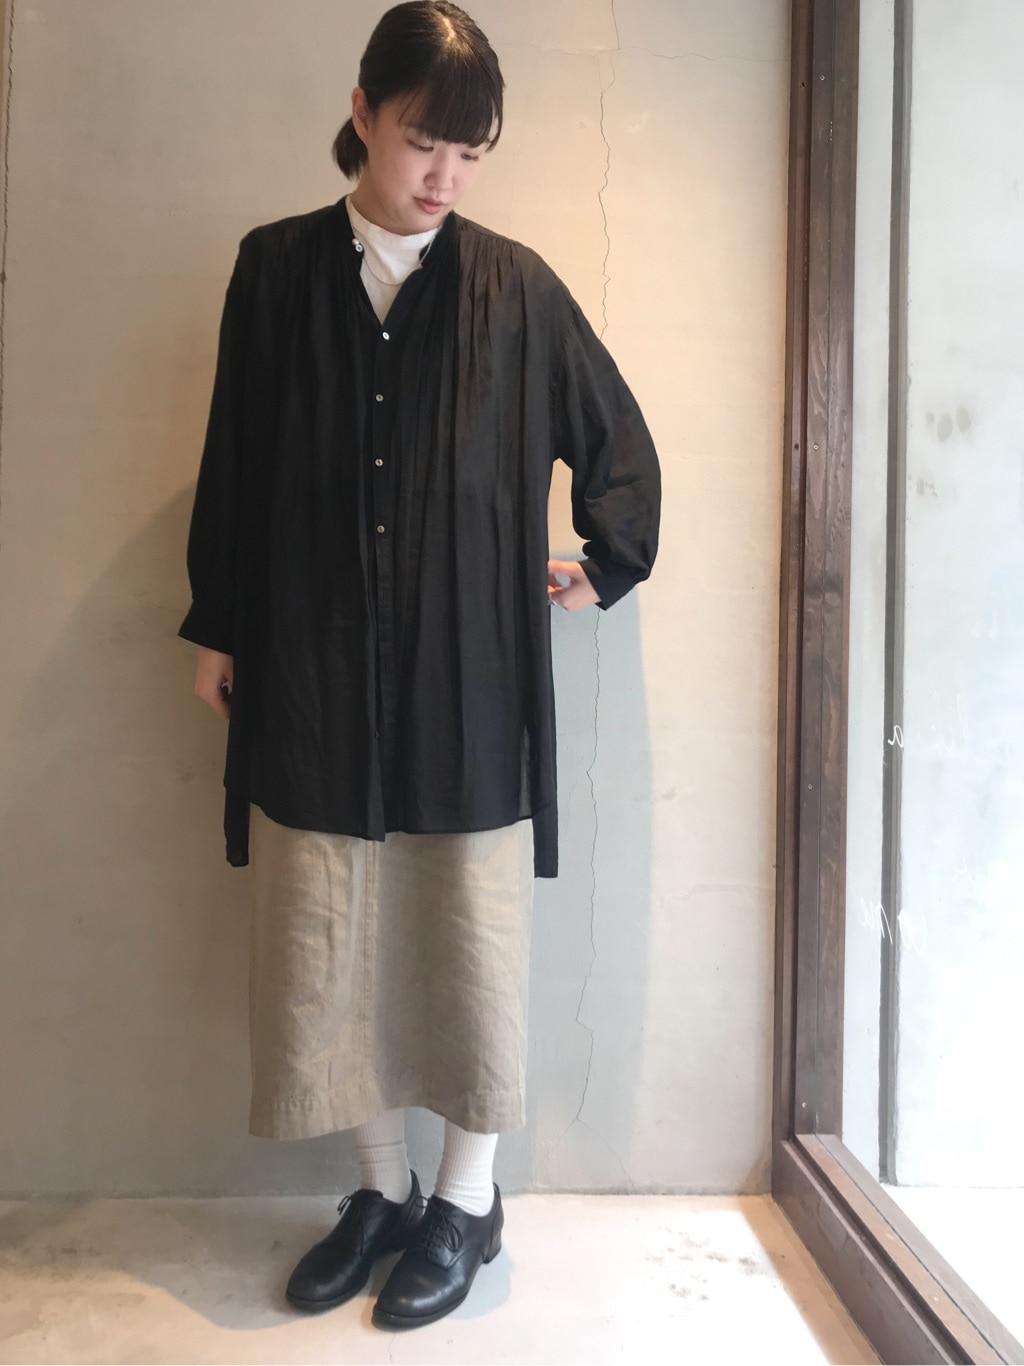 yuni 神戸路面 身長:166cm 2020.09.12